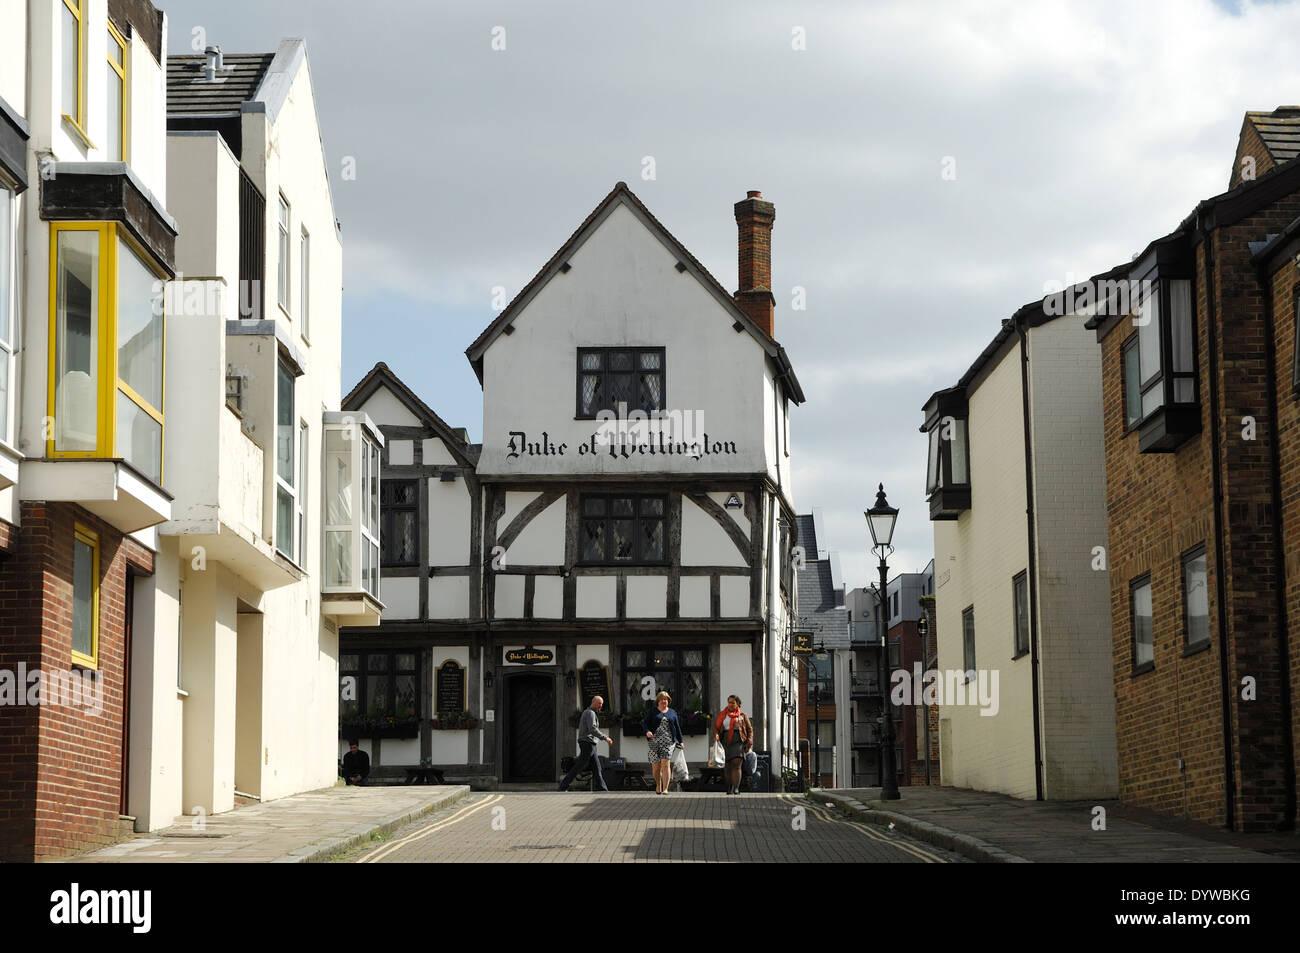 Modern Terrace Homes & Duke of Wellington Tudor Pub, Southampton, UK - Stock Image